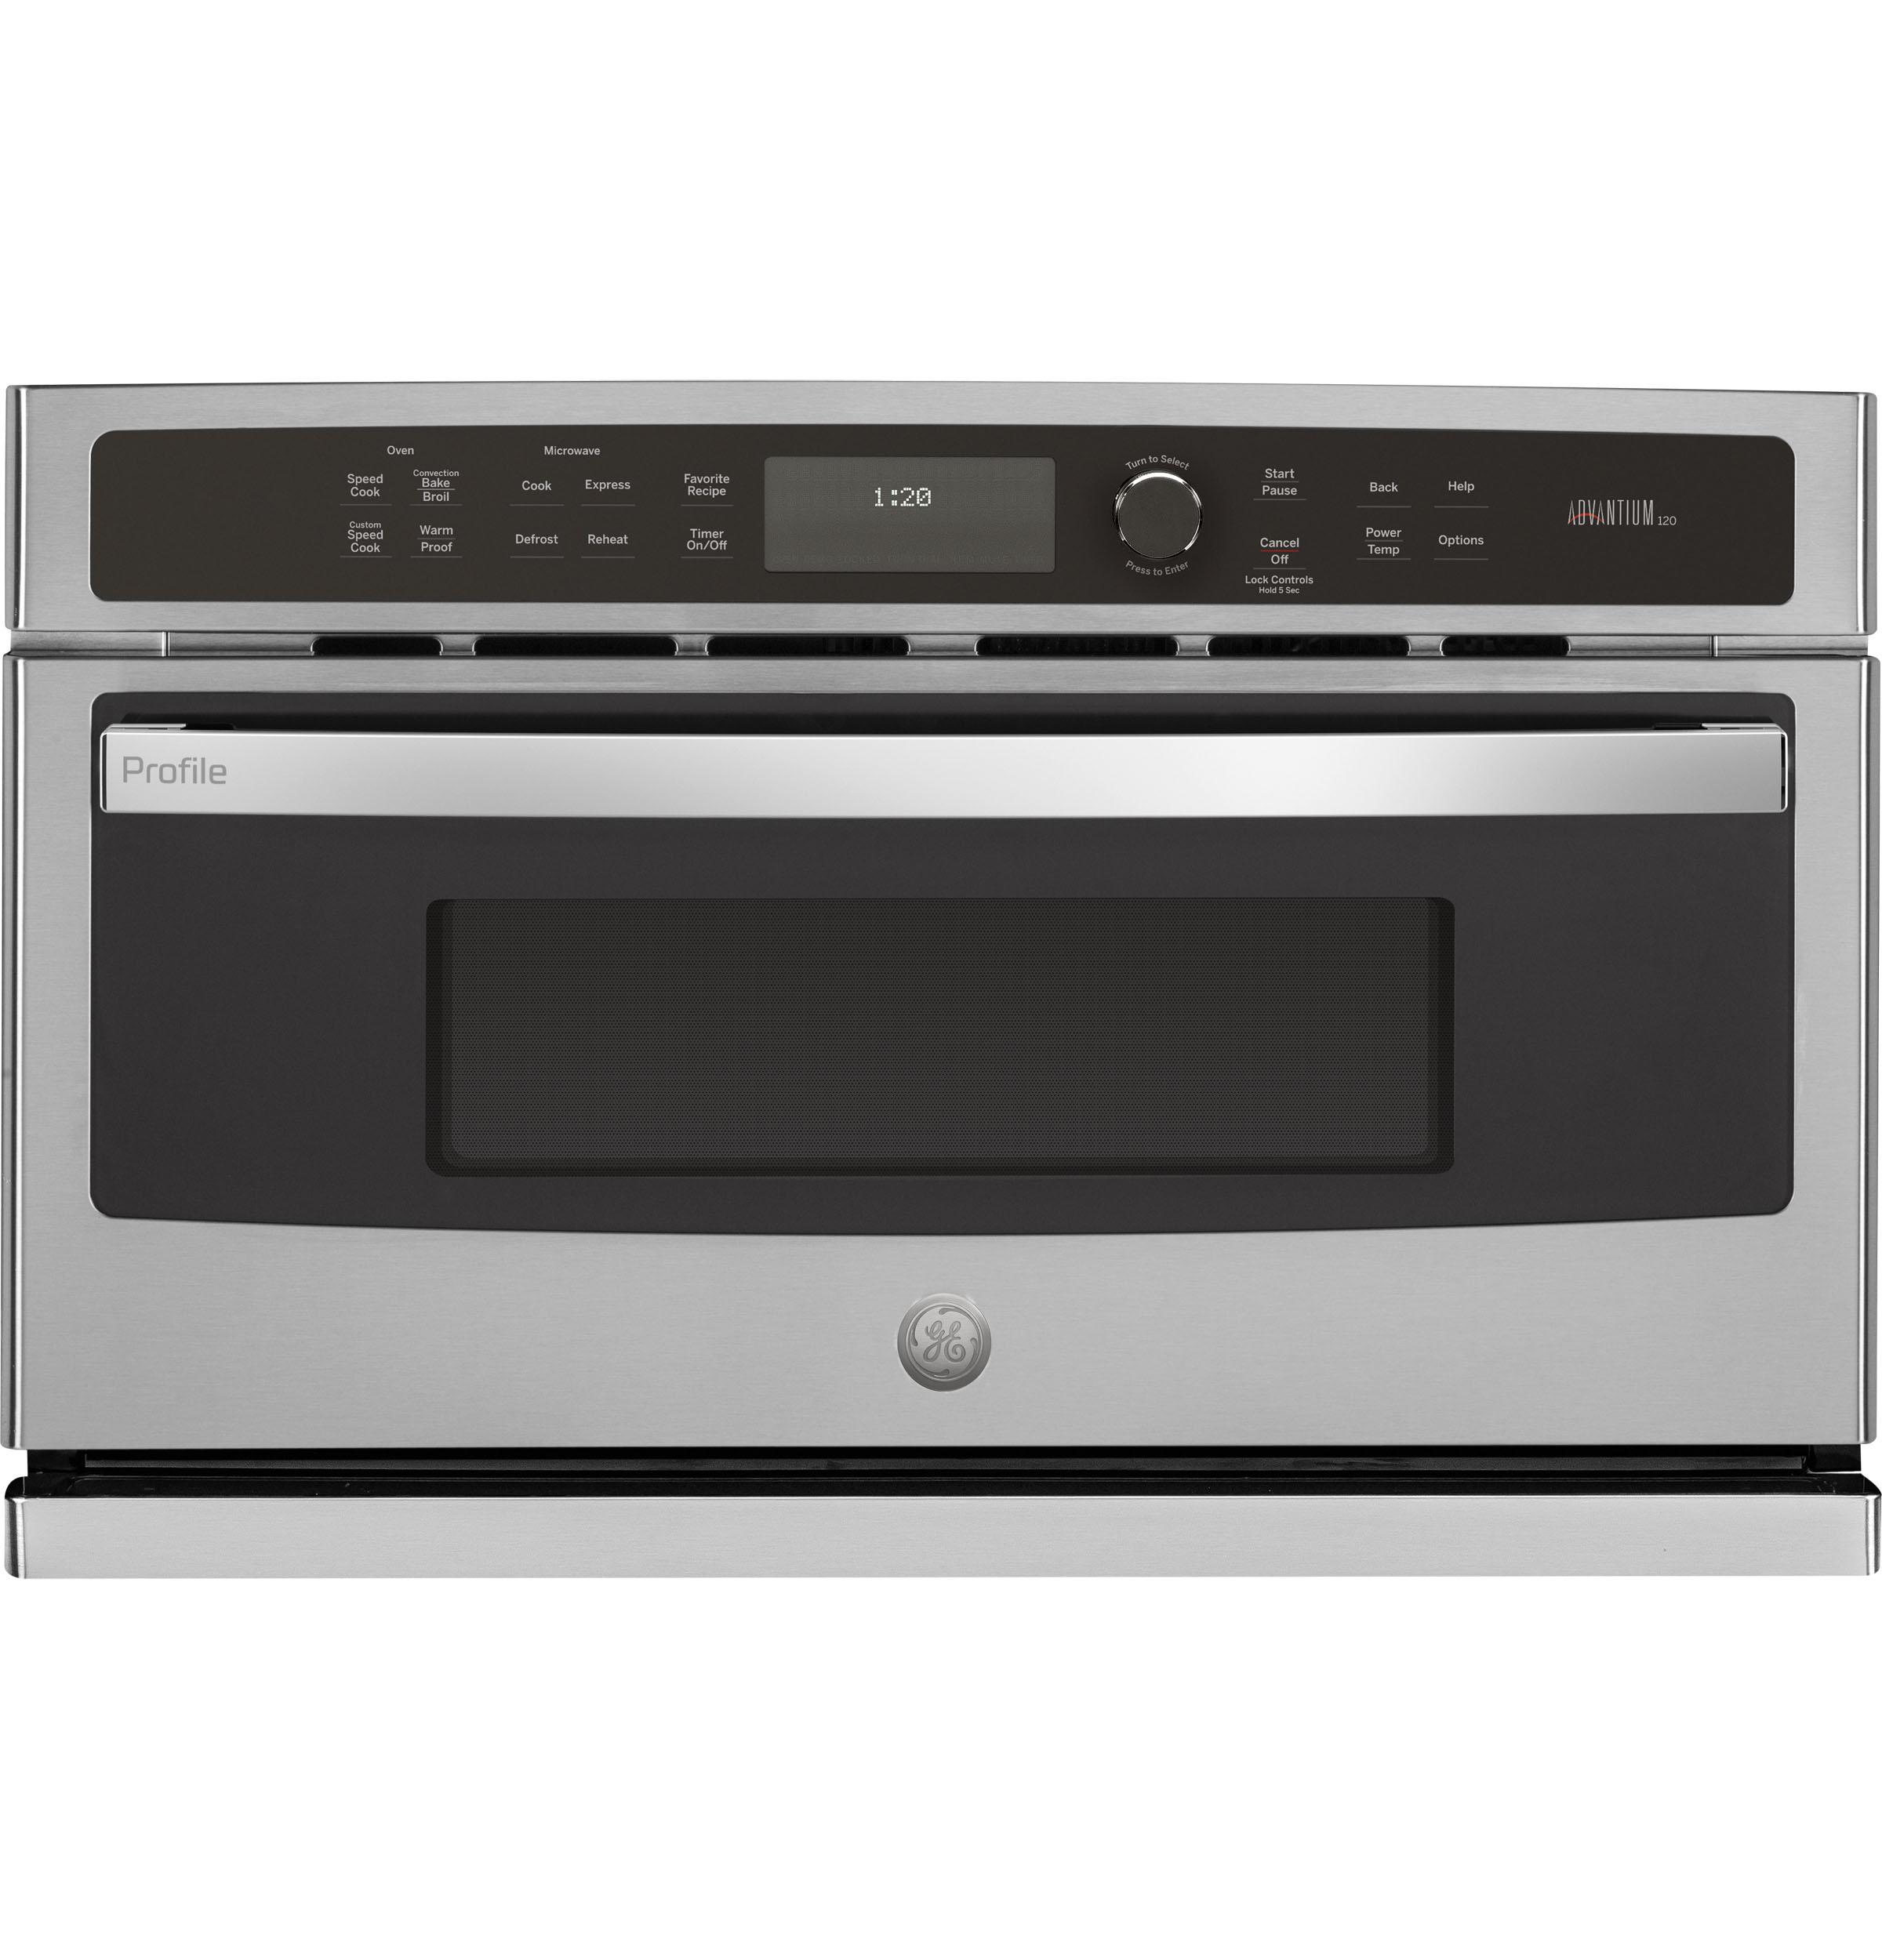 Model: PSB9120SFSS   GE Profile GE Profile™ 30 in. Single Wall Oven with Advantium® Technology